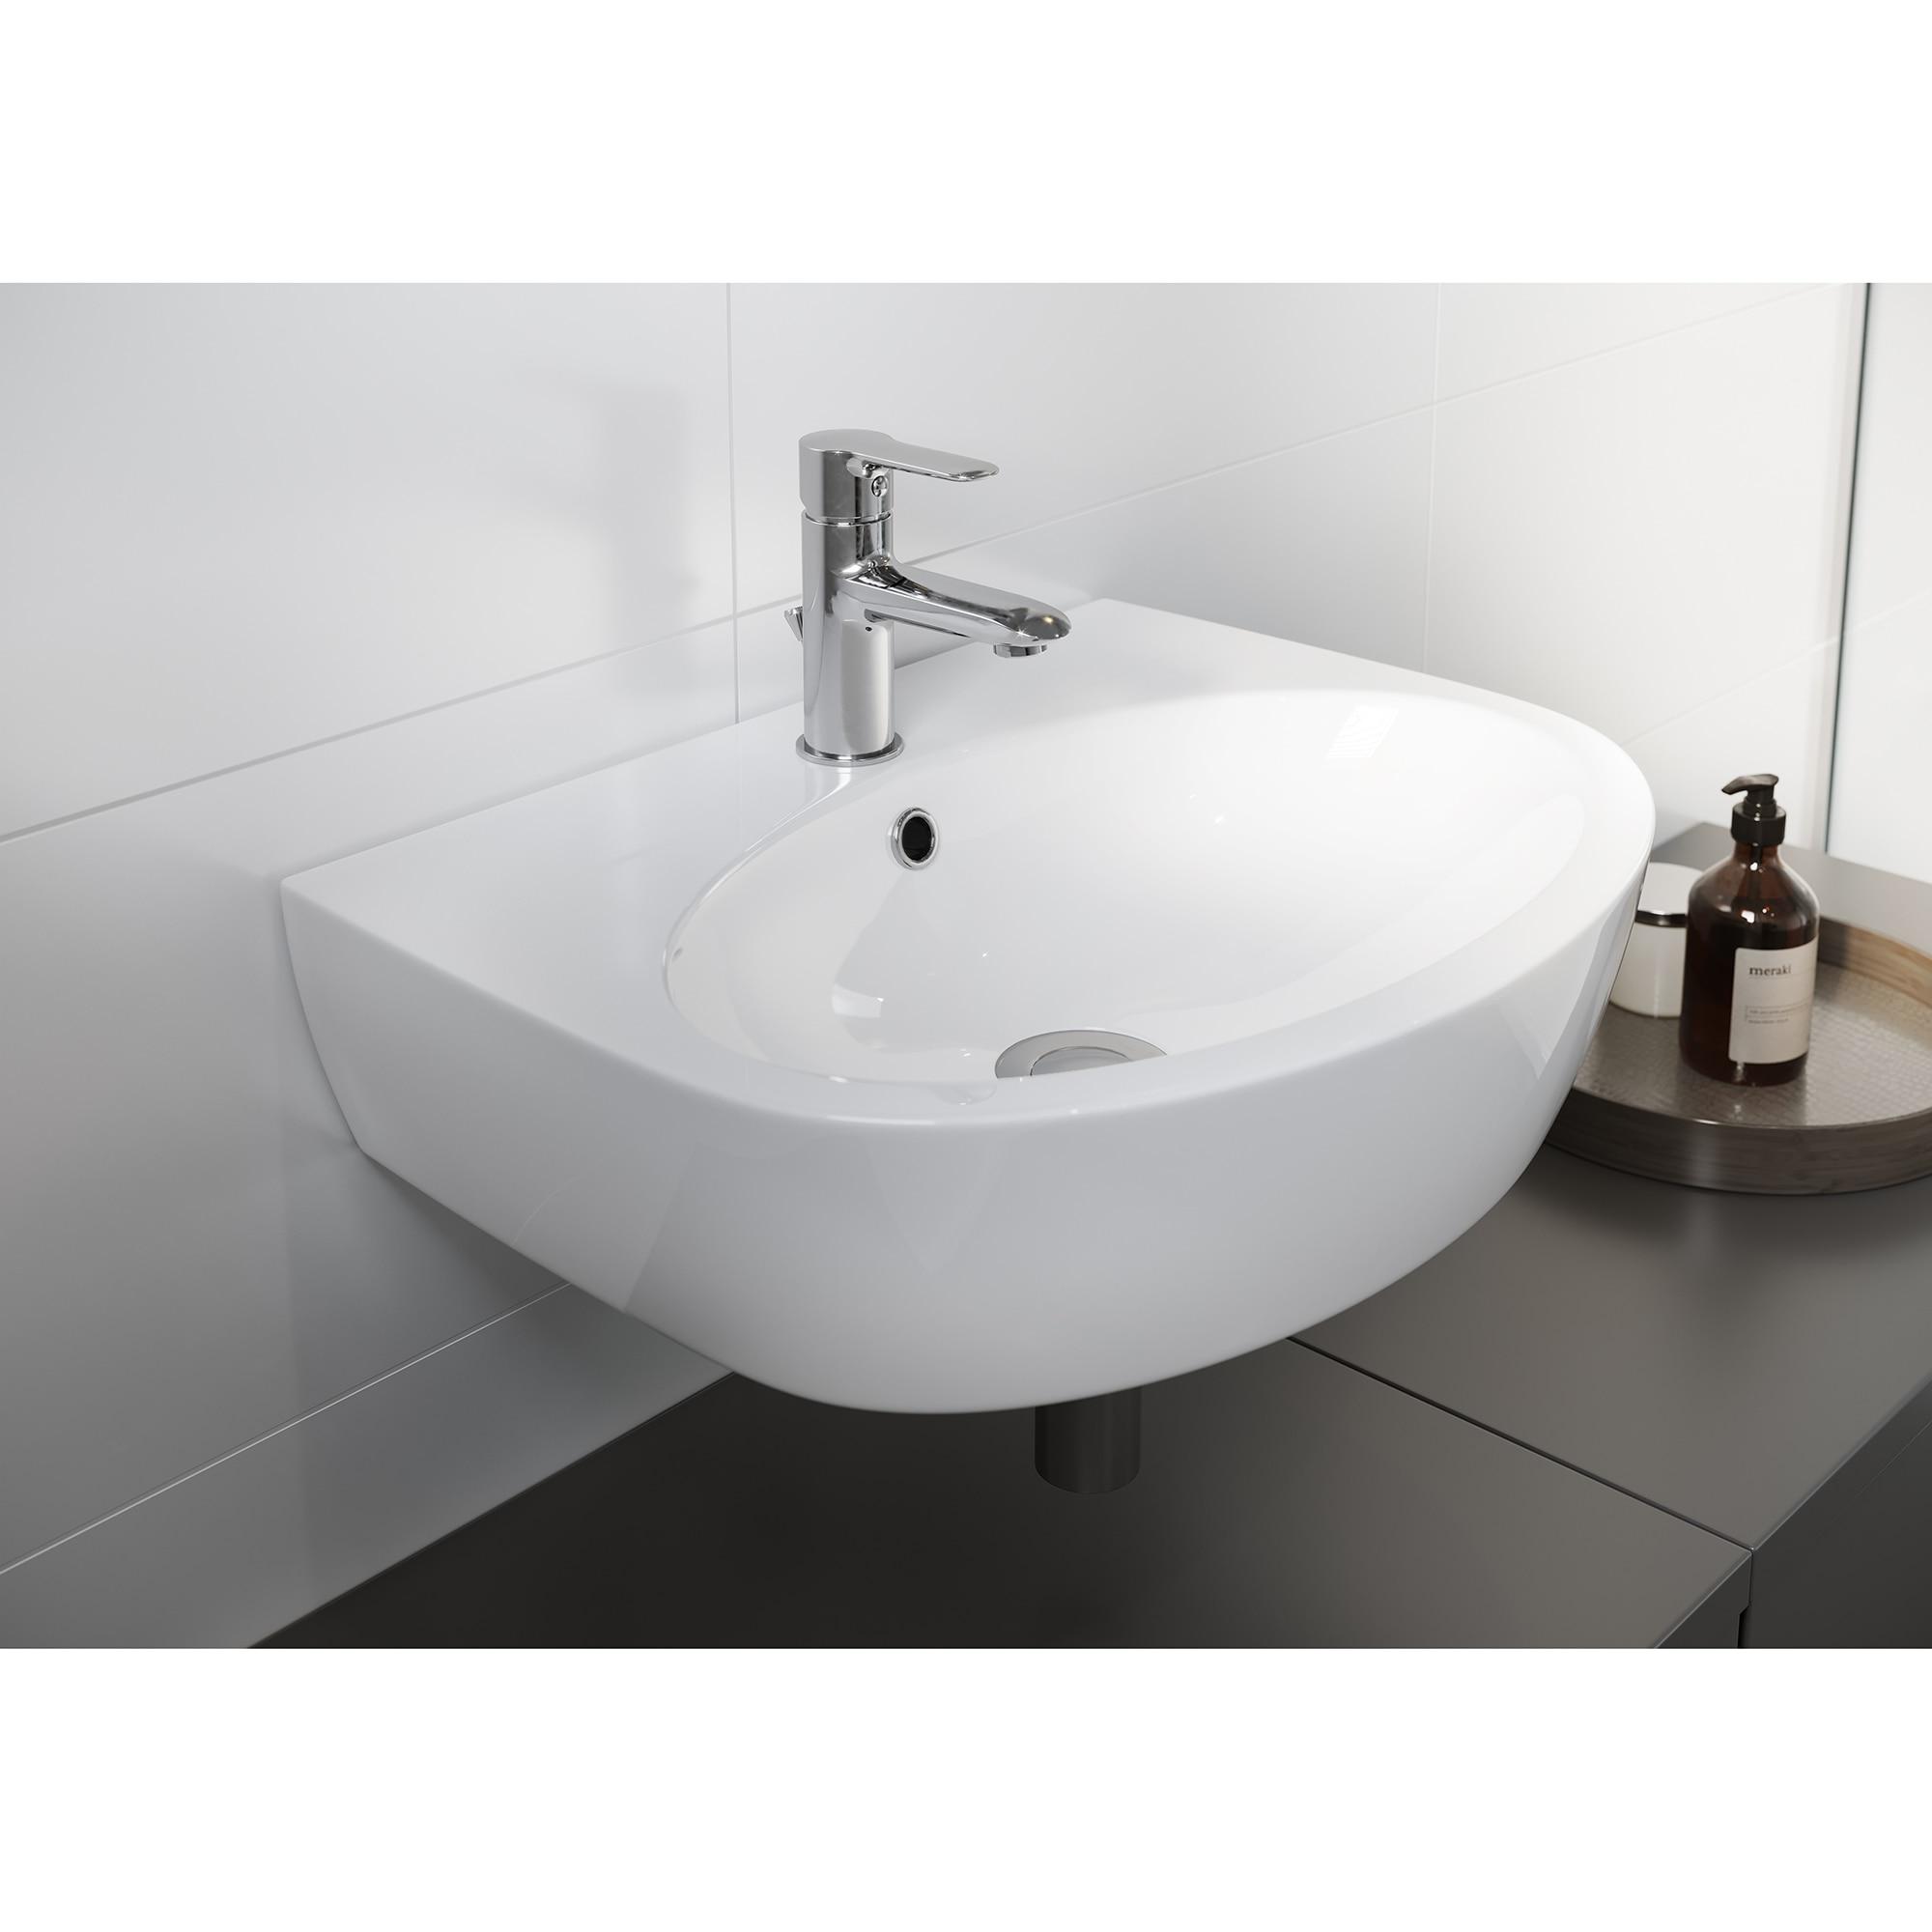 Fotografie Lavoar (chiuveta baie) Cersanit Viva, K27-116, ceramica, montare semi-piedestal/perete, 50 cm